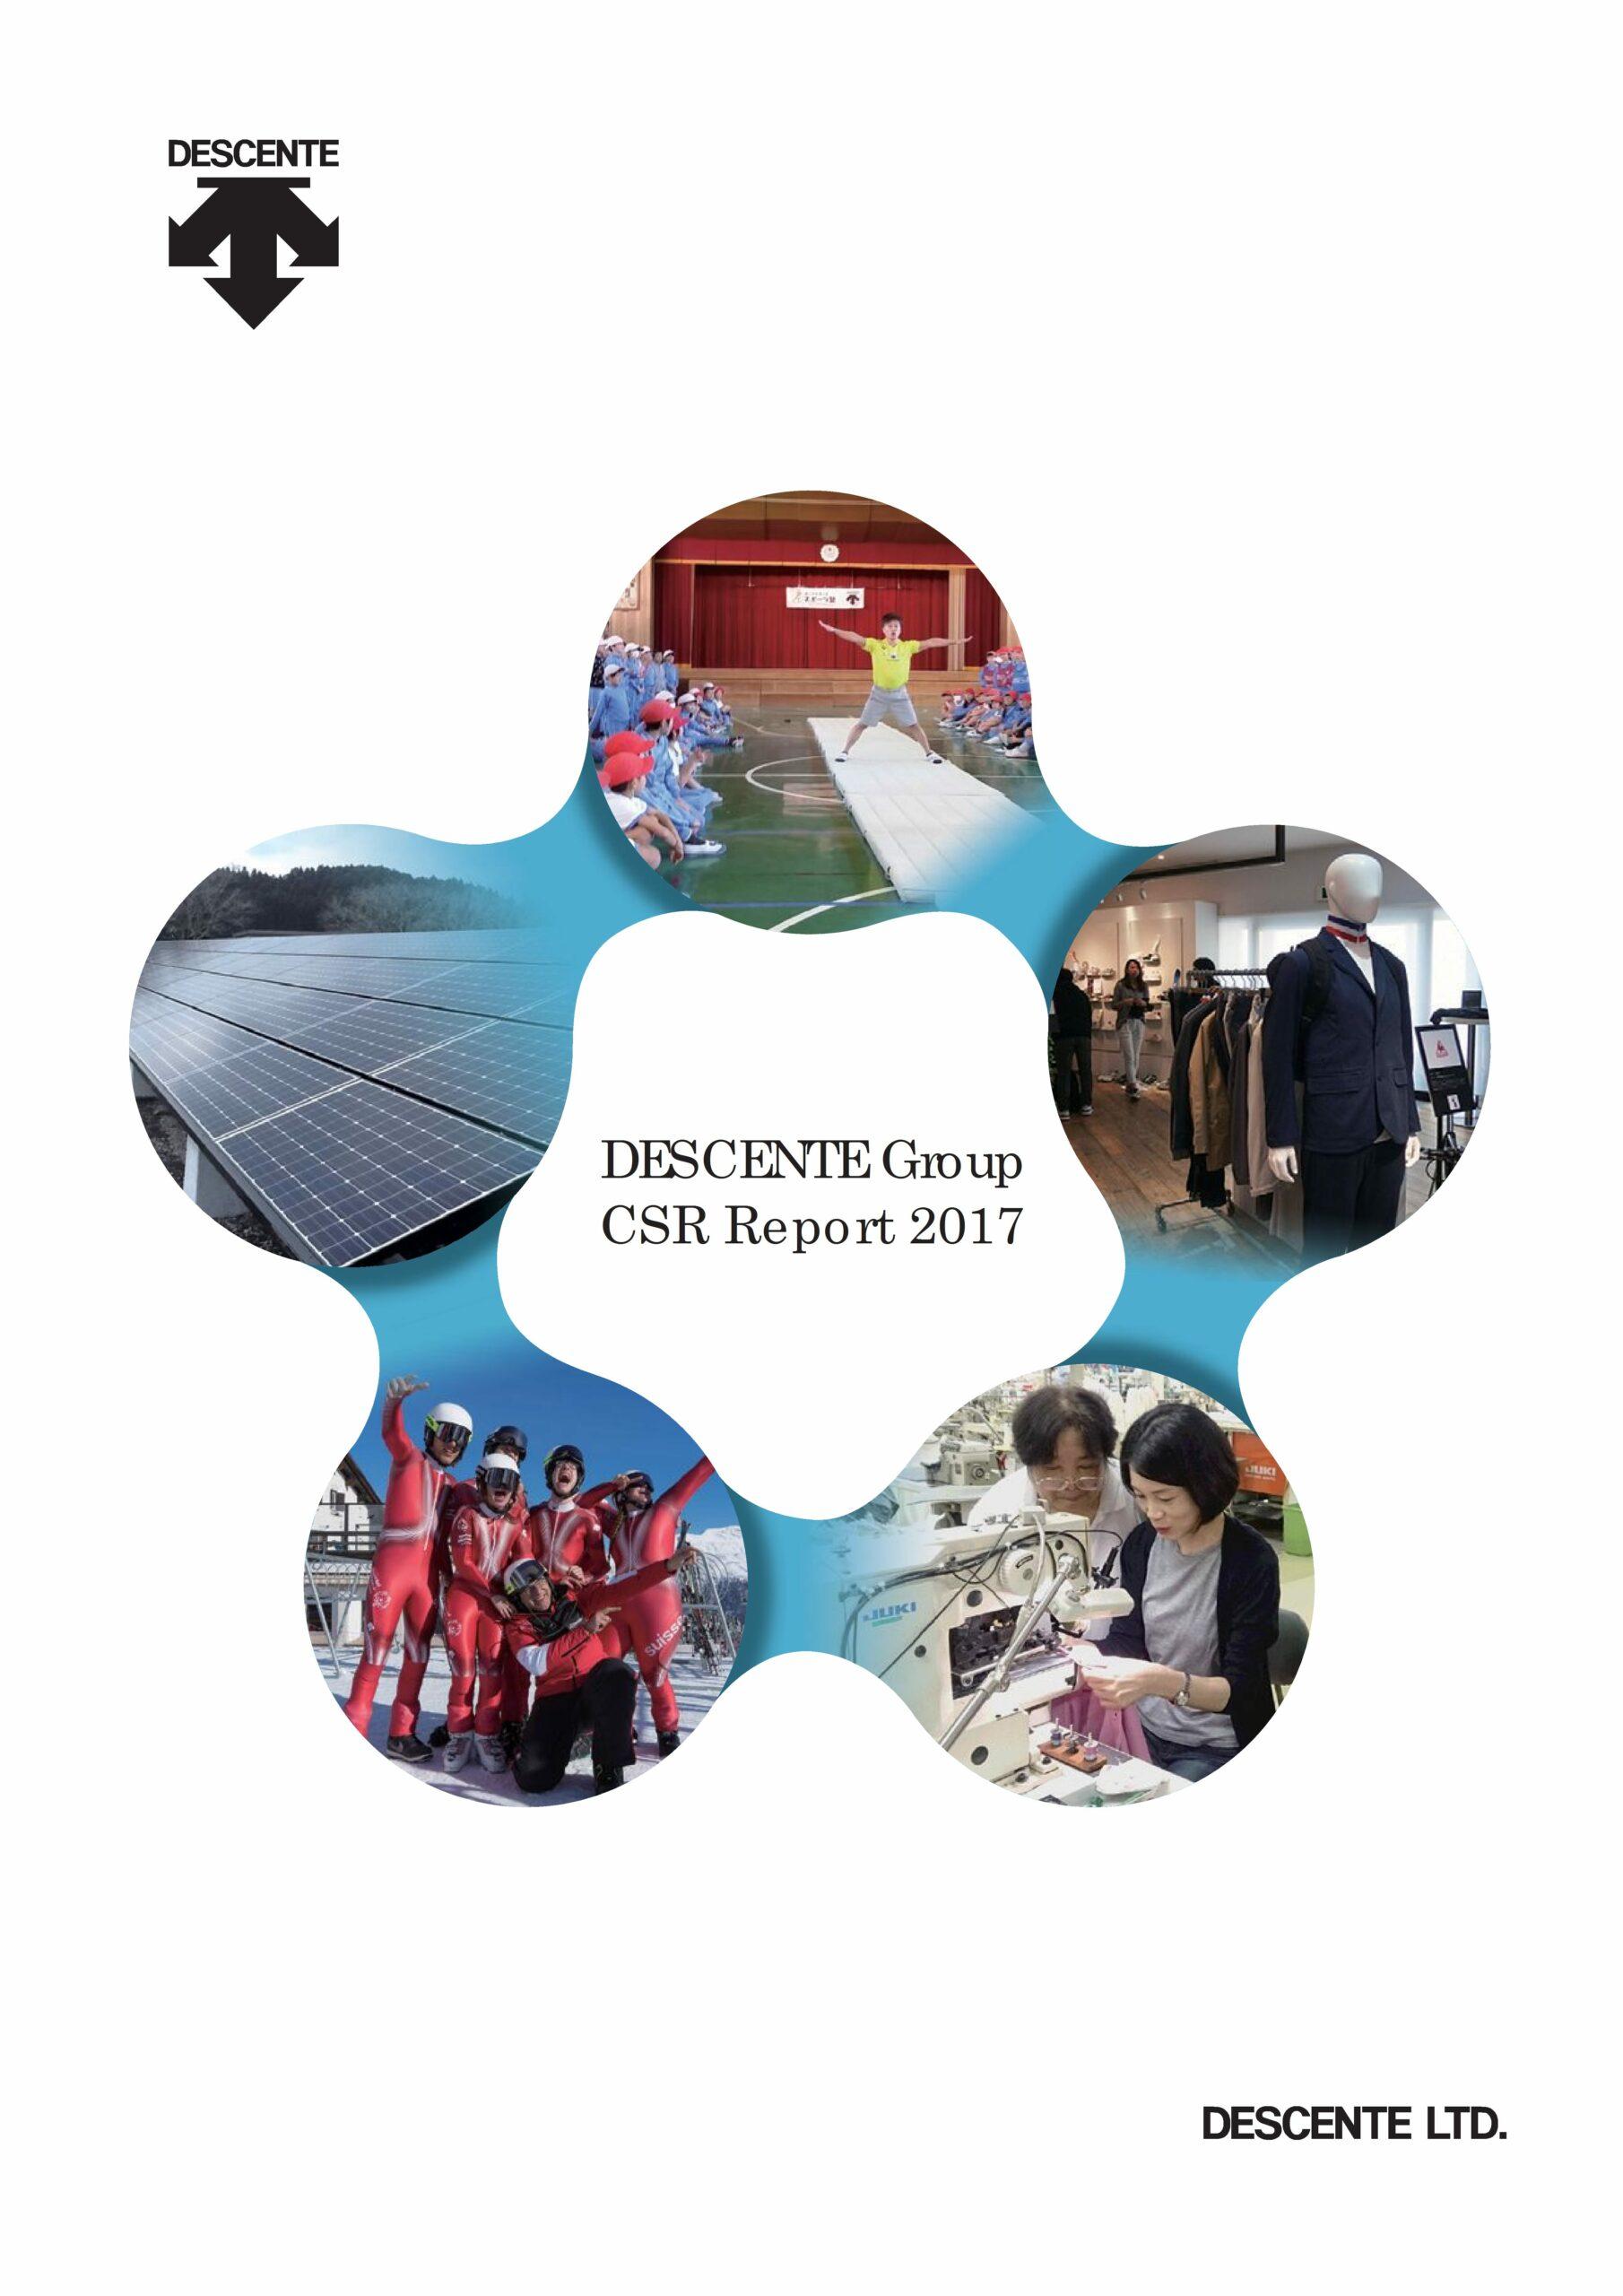 DESCENTE Group CSR Report 2017(English)